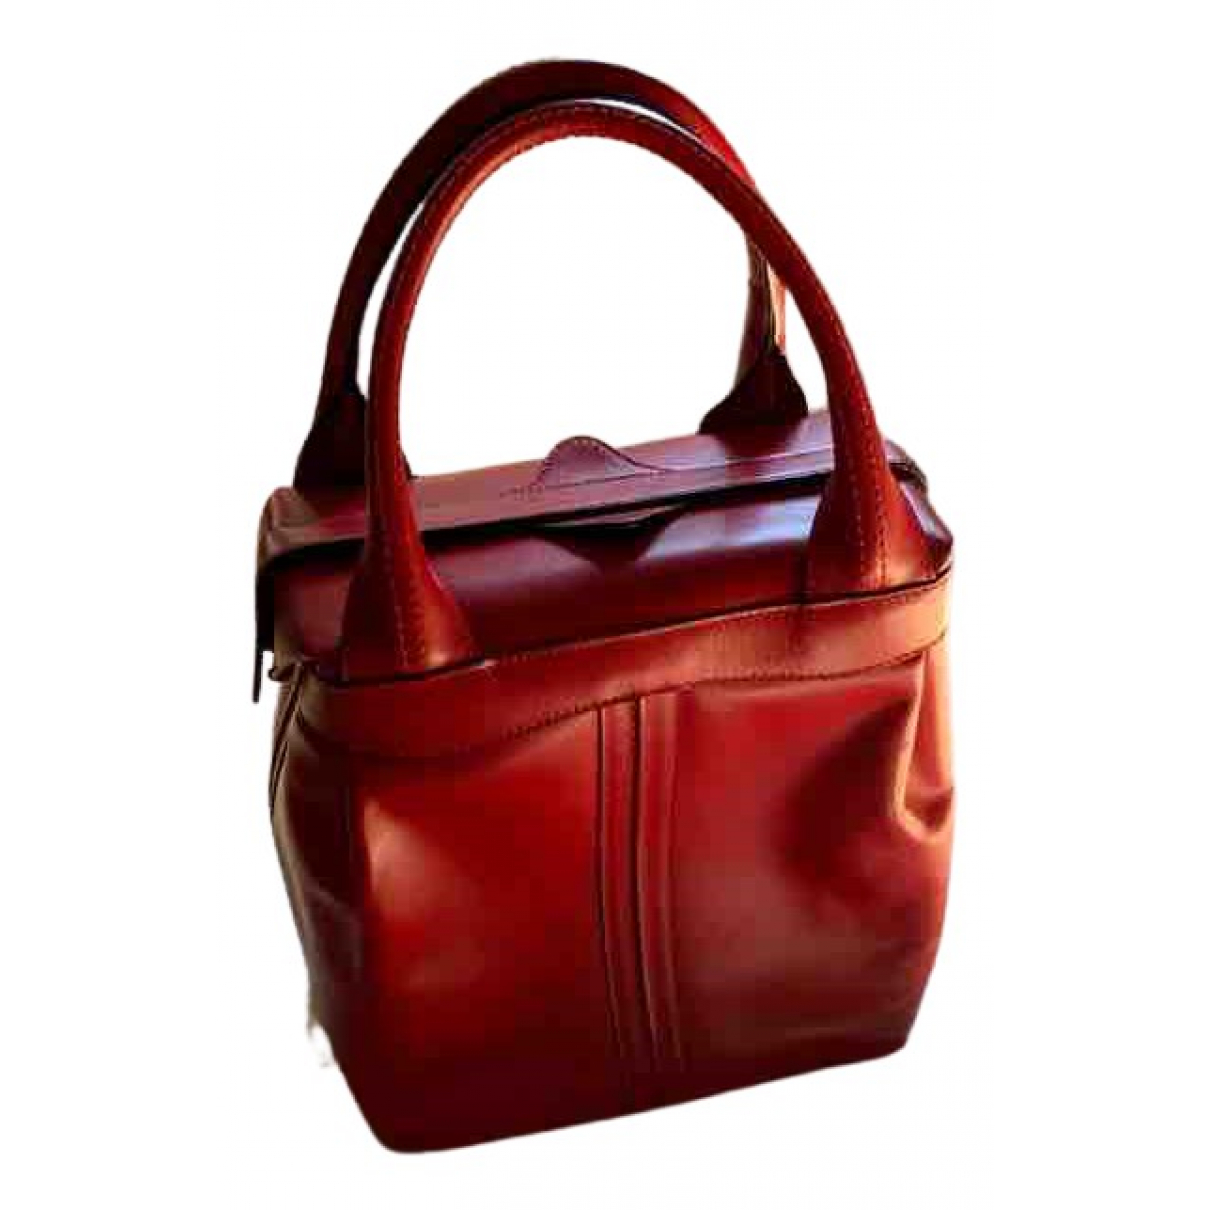 Valextra \N Red Leather handbag for Women \N